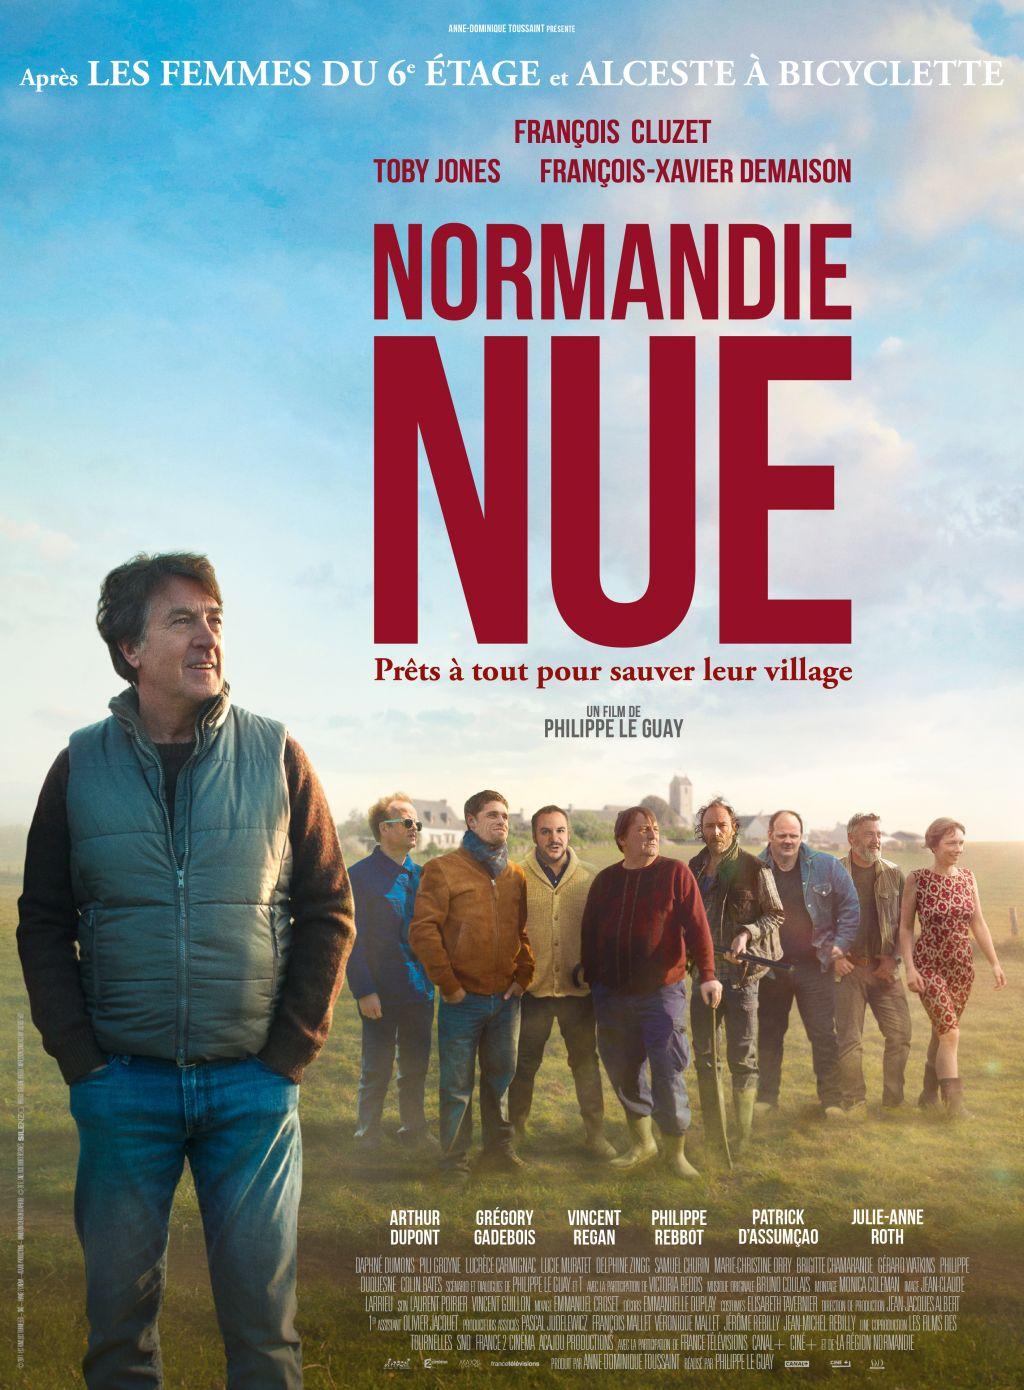 Nude Normandy